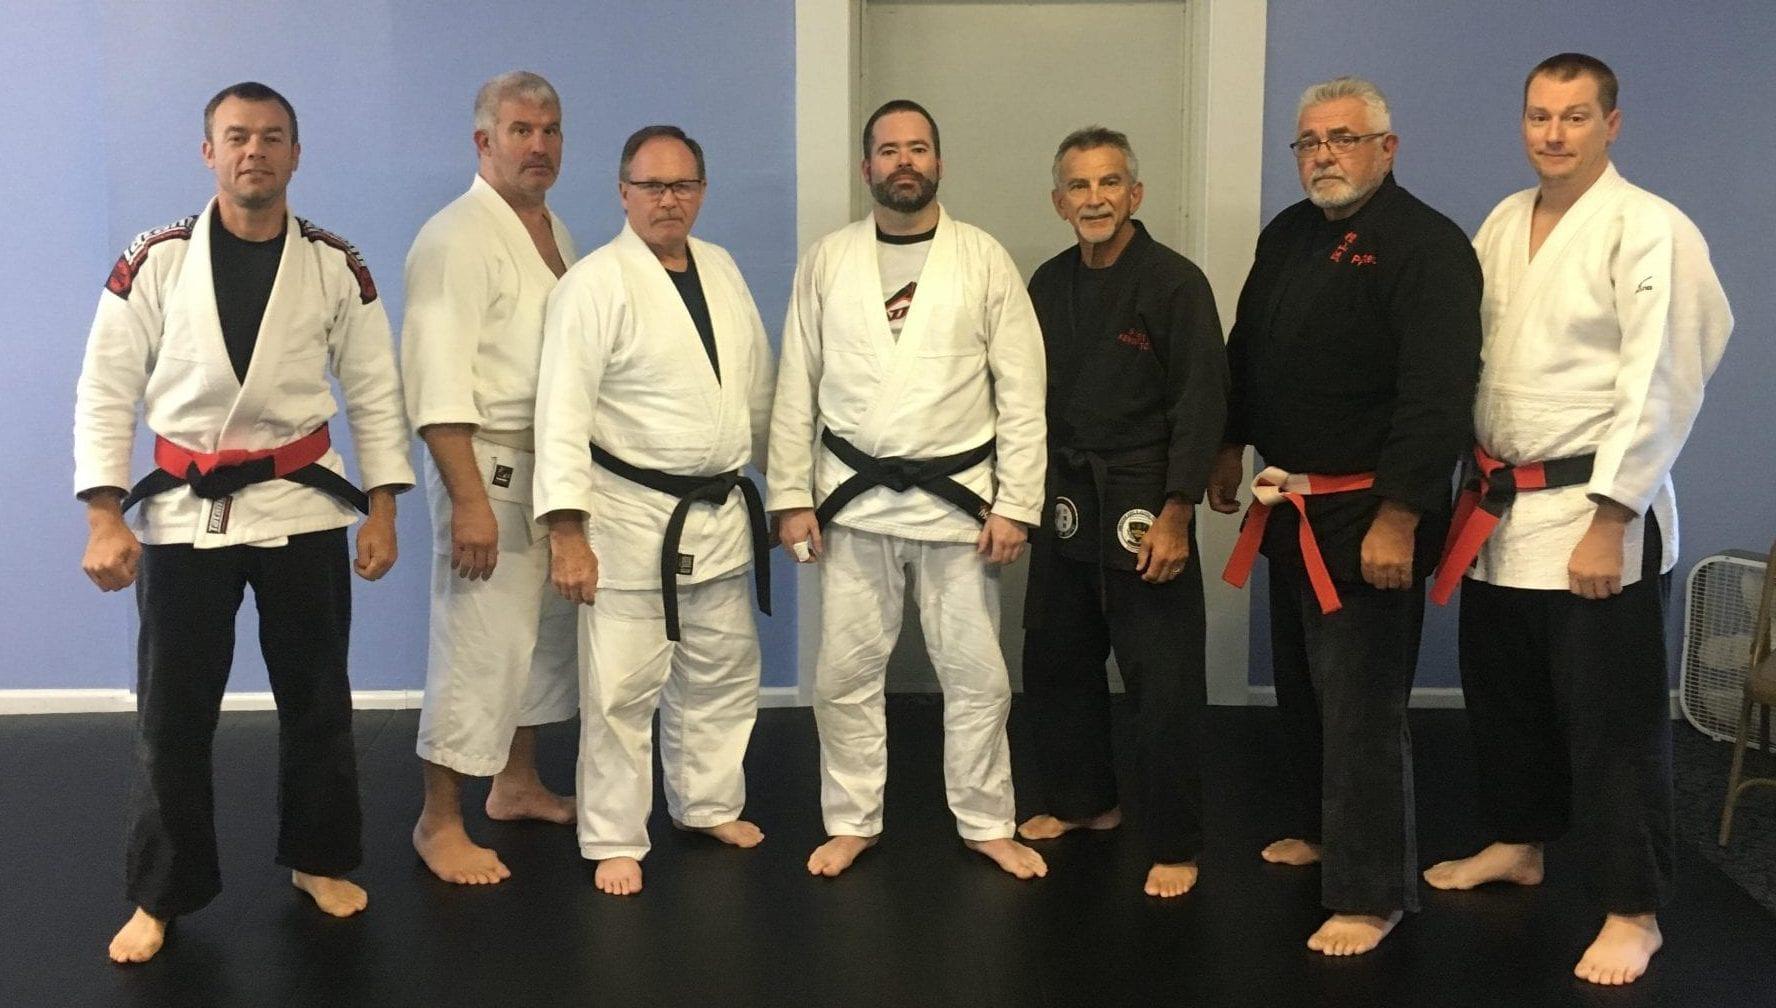 Black Belt Examinee group